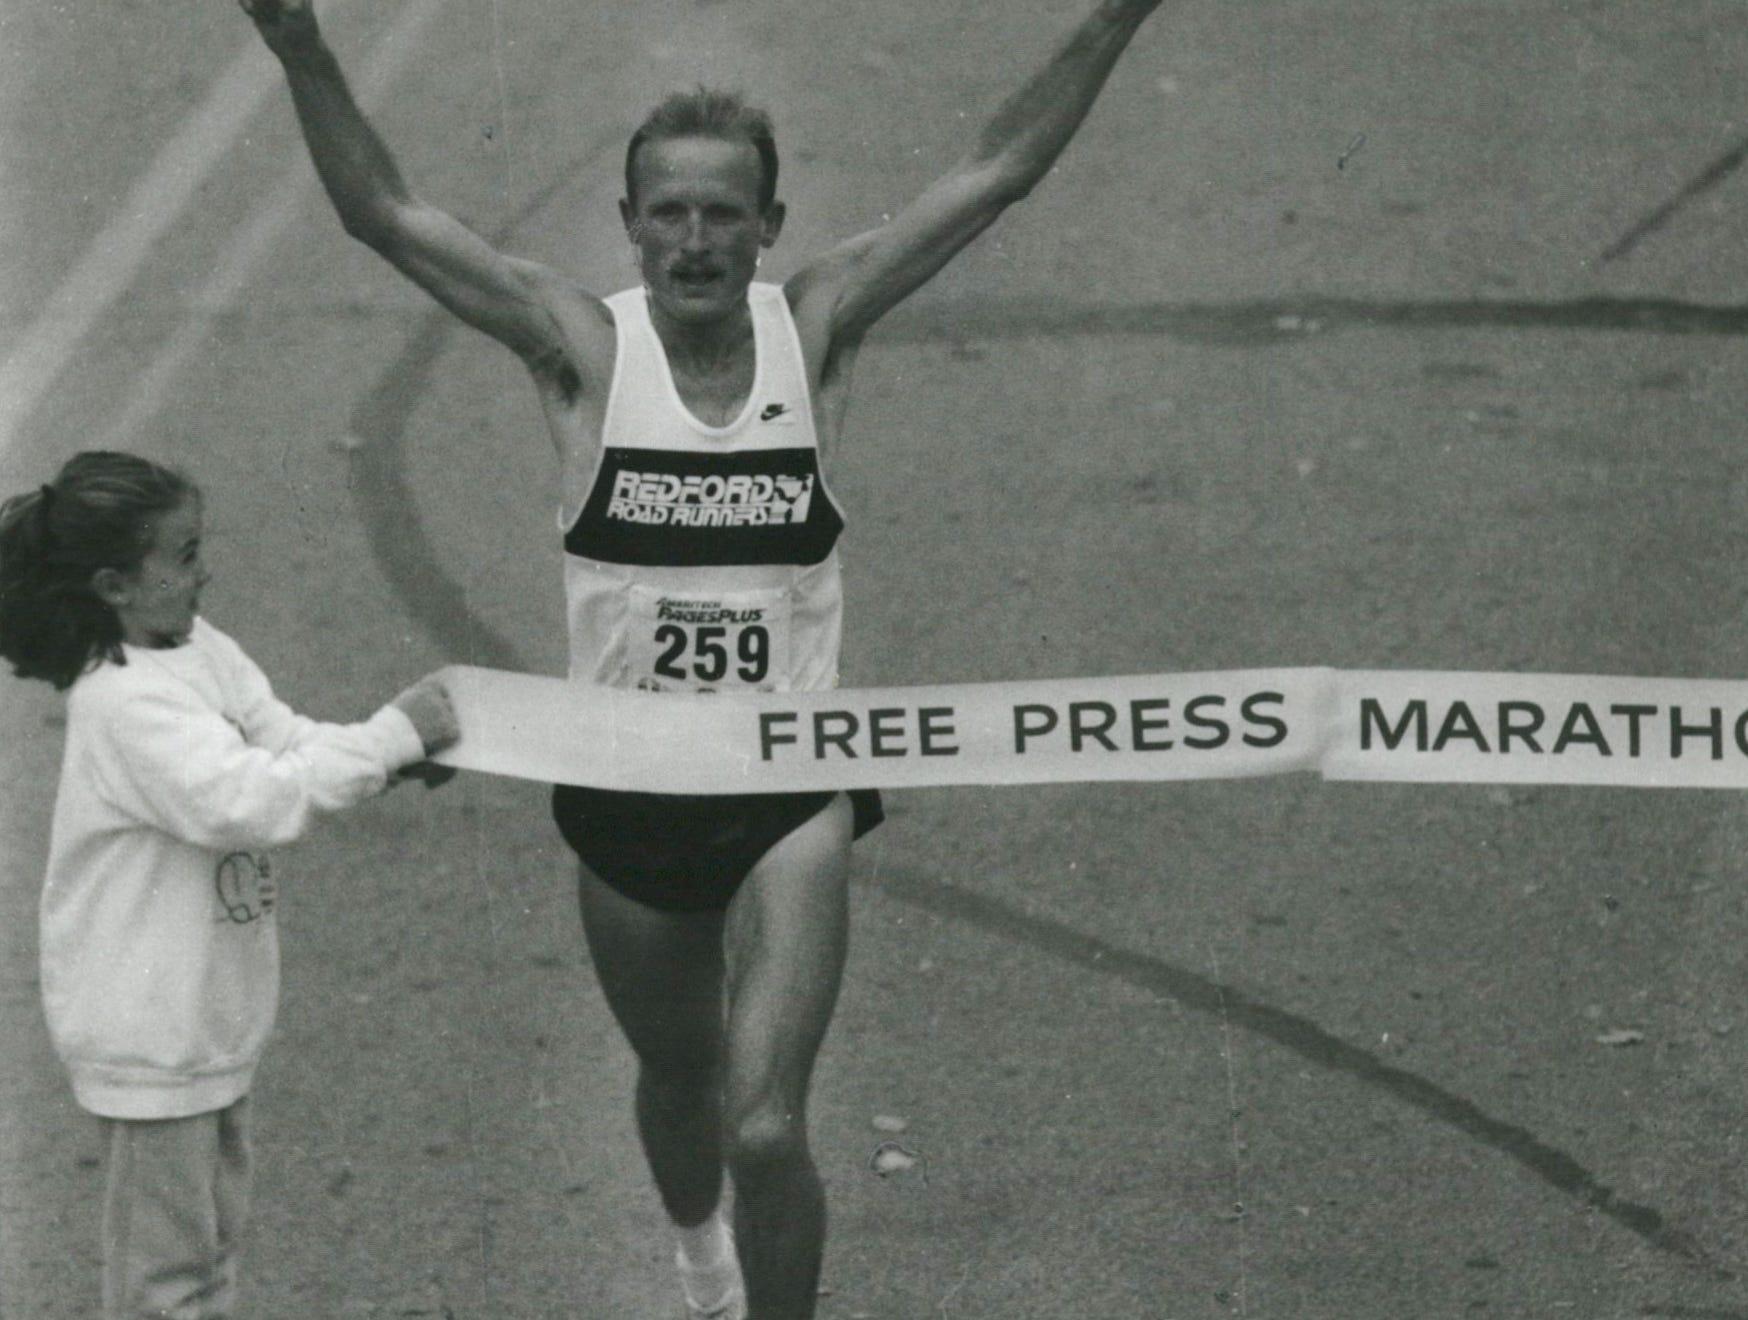 Doug Kurtis, men' s winner of the Free Press Marathon, crosses the finish line at Belle Isle in 1988